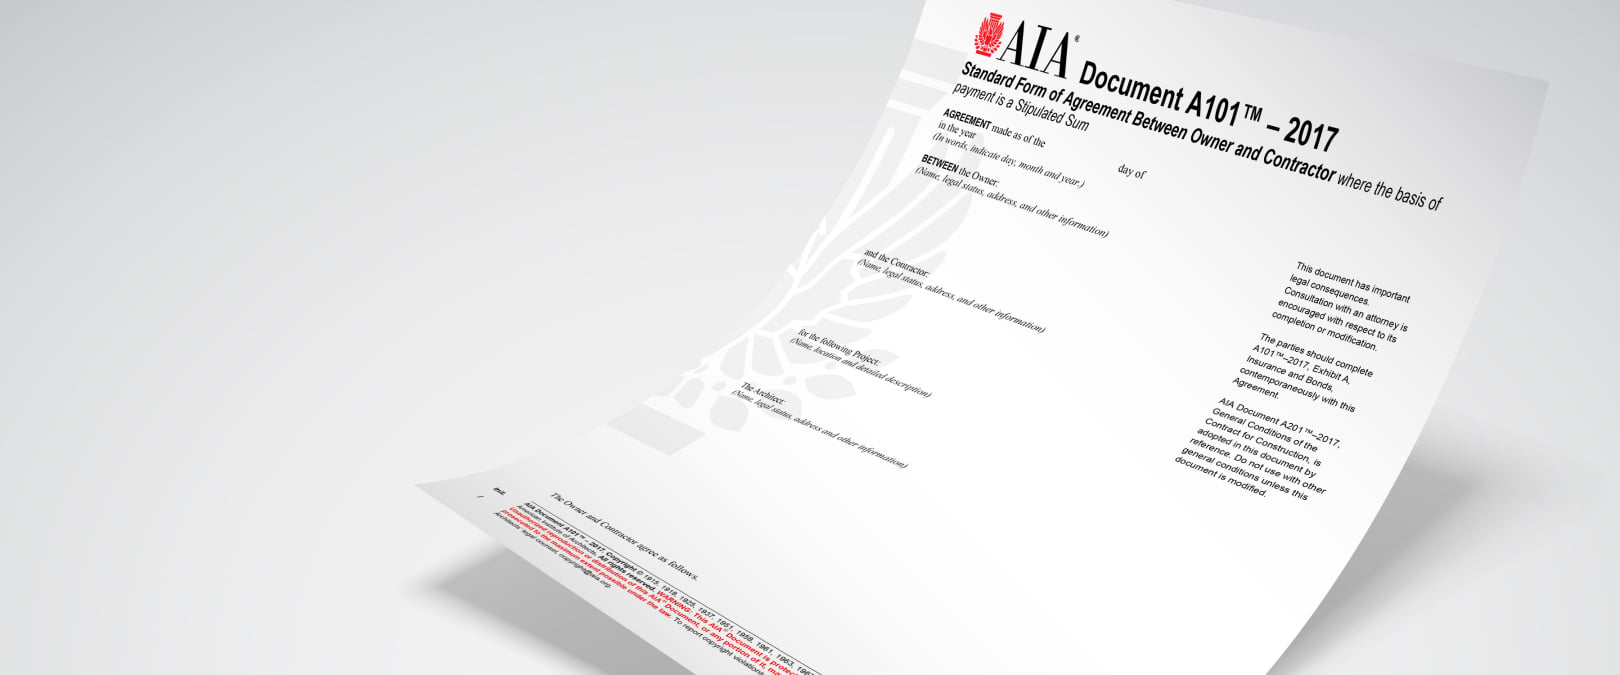 Aia A101 Short Form